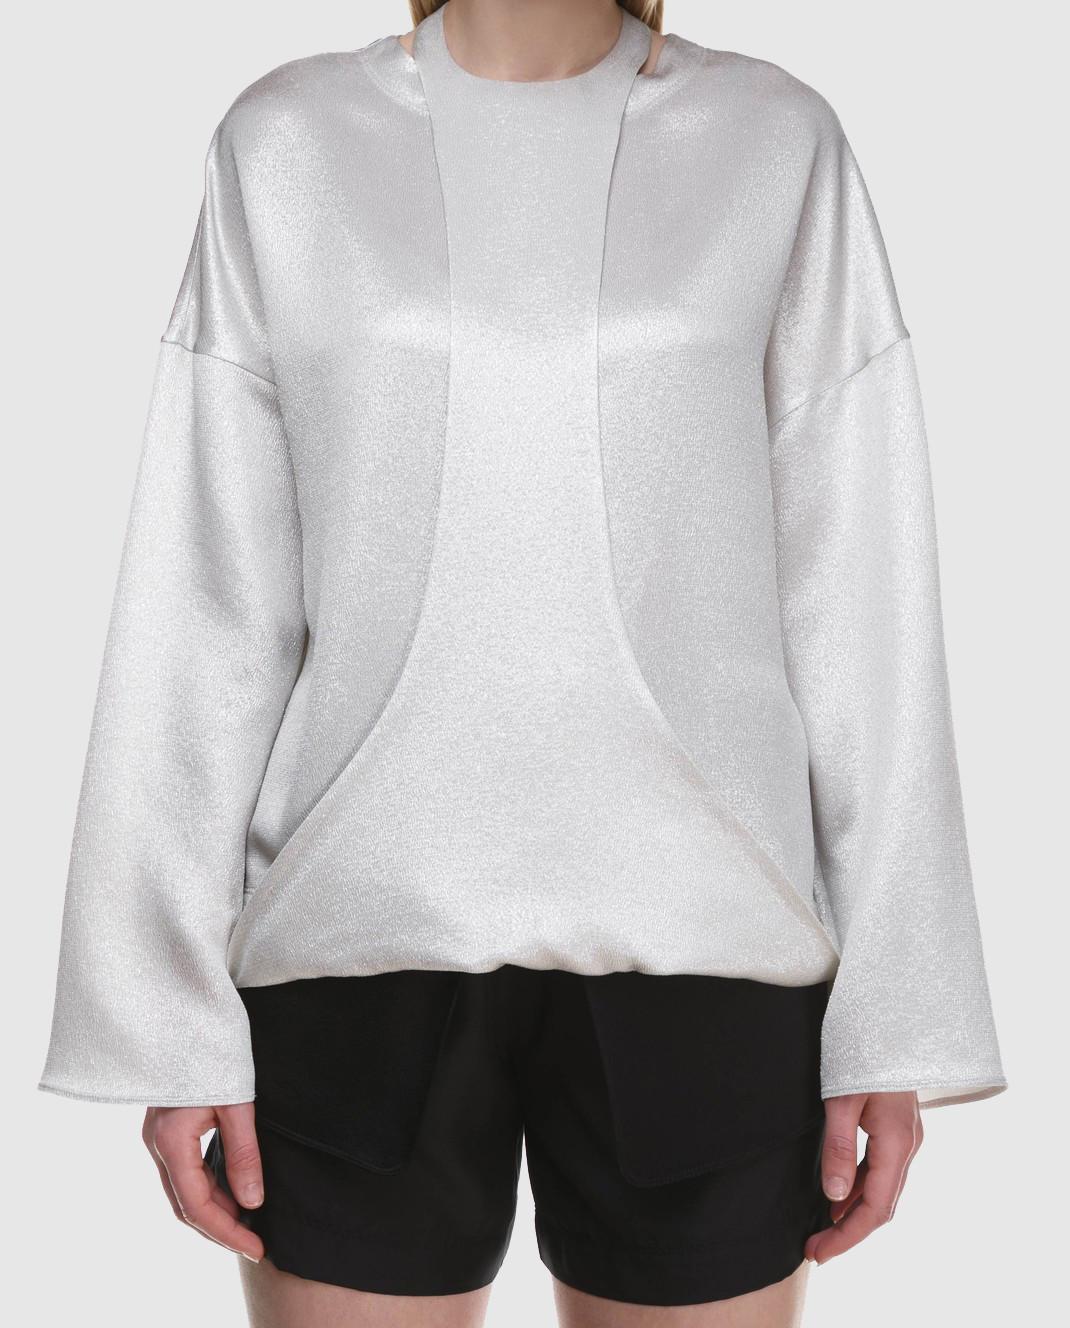 Valentino Серебристая блуза с длинным рукавом PB0AE2R53VF изображение 4